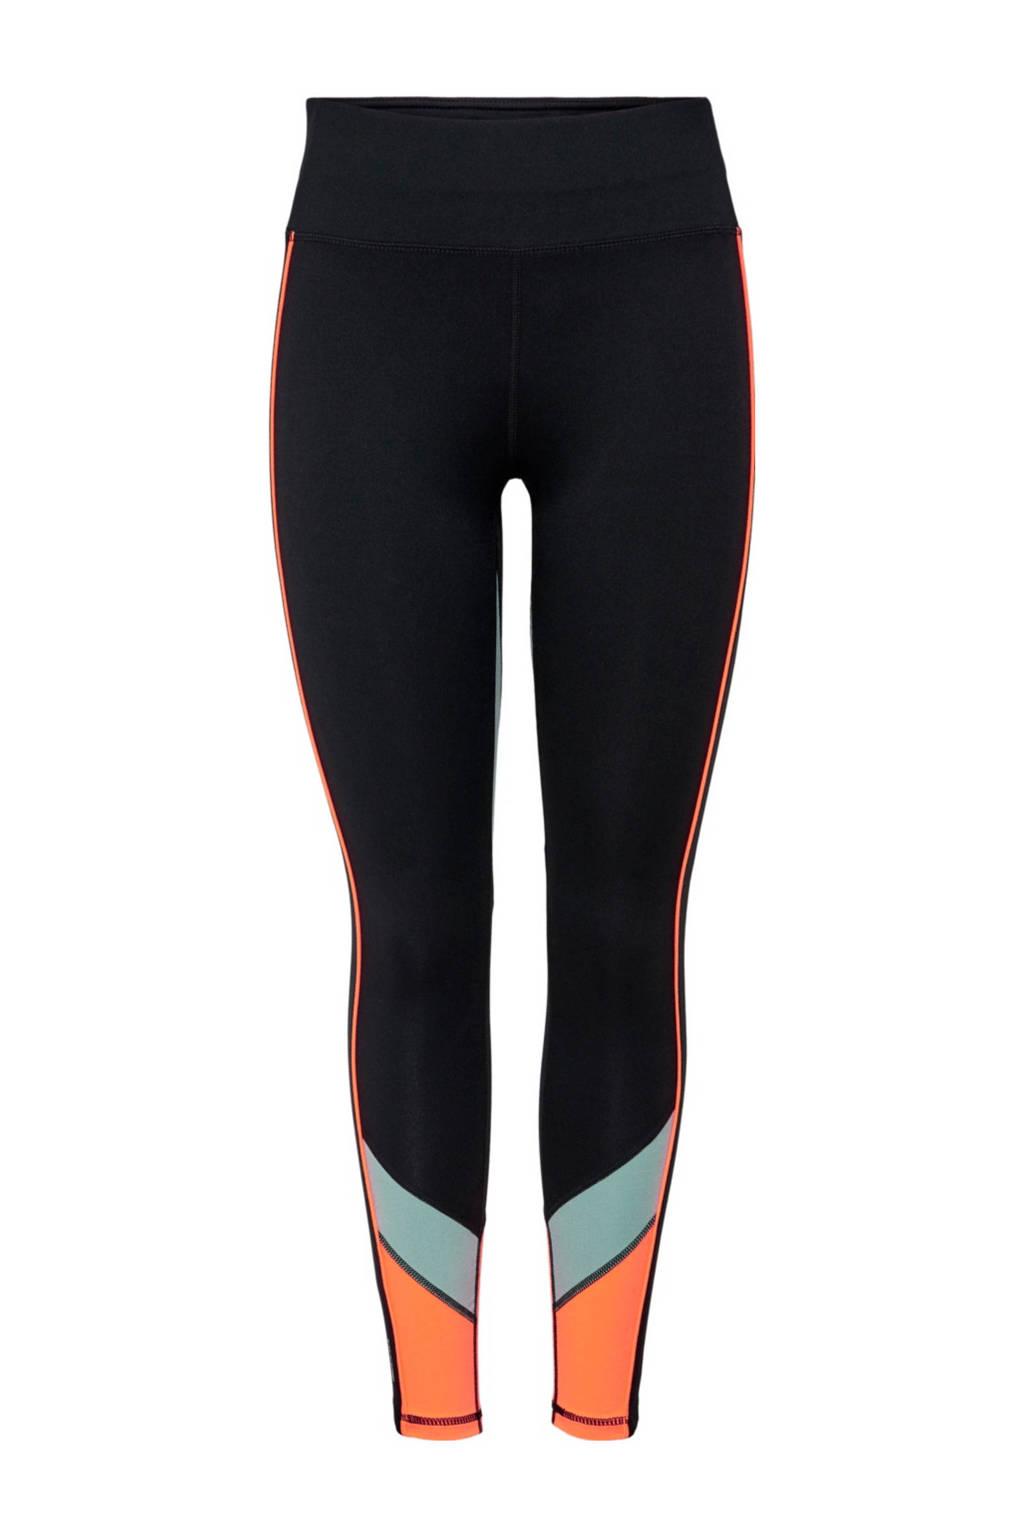 ONLY PLAY Girls sportbroek Dando zwart/oranje/mintgroen, Zwart/oranje/mintgroen